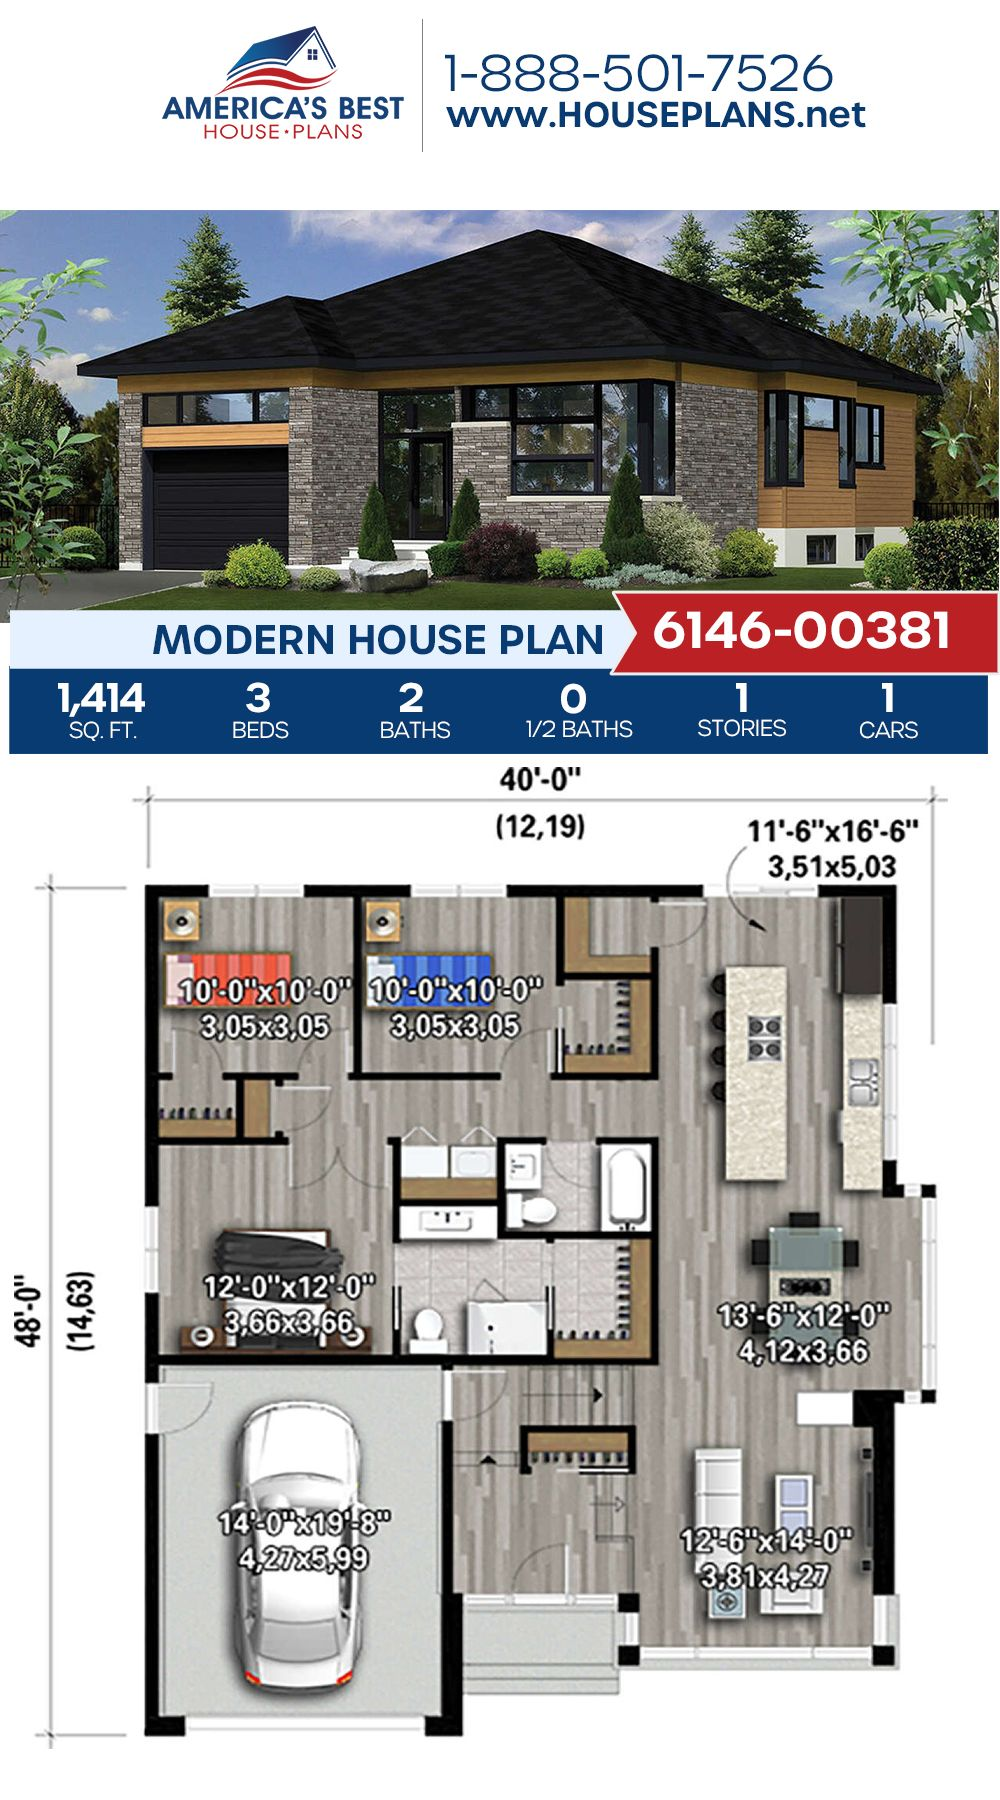 House Plan 6146 00381 Modern Plan 1 414 Square Feet 3 Bedrooms 2 Bathrooms In 2020 House Plans Modern House Plan Best House Plans